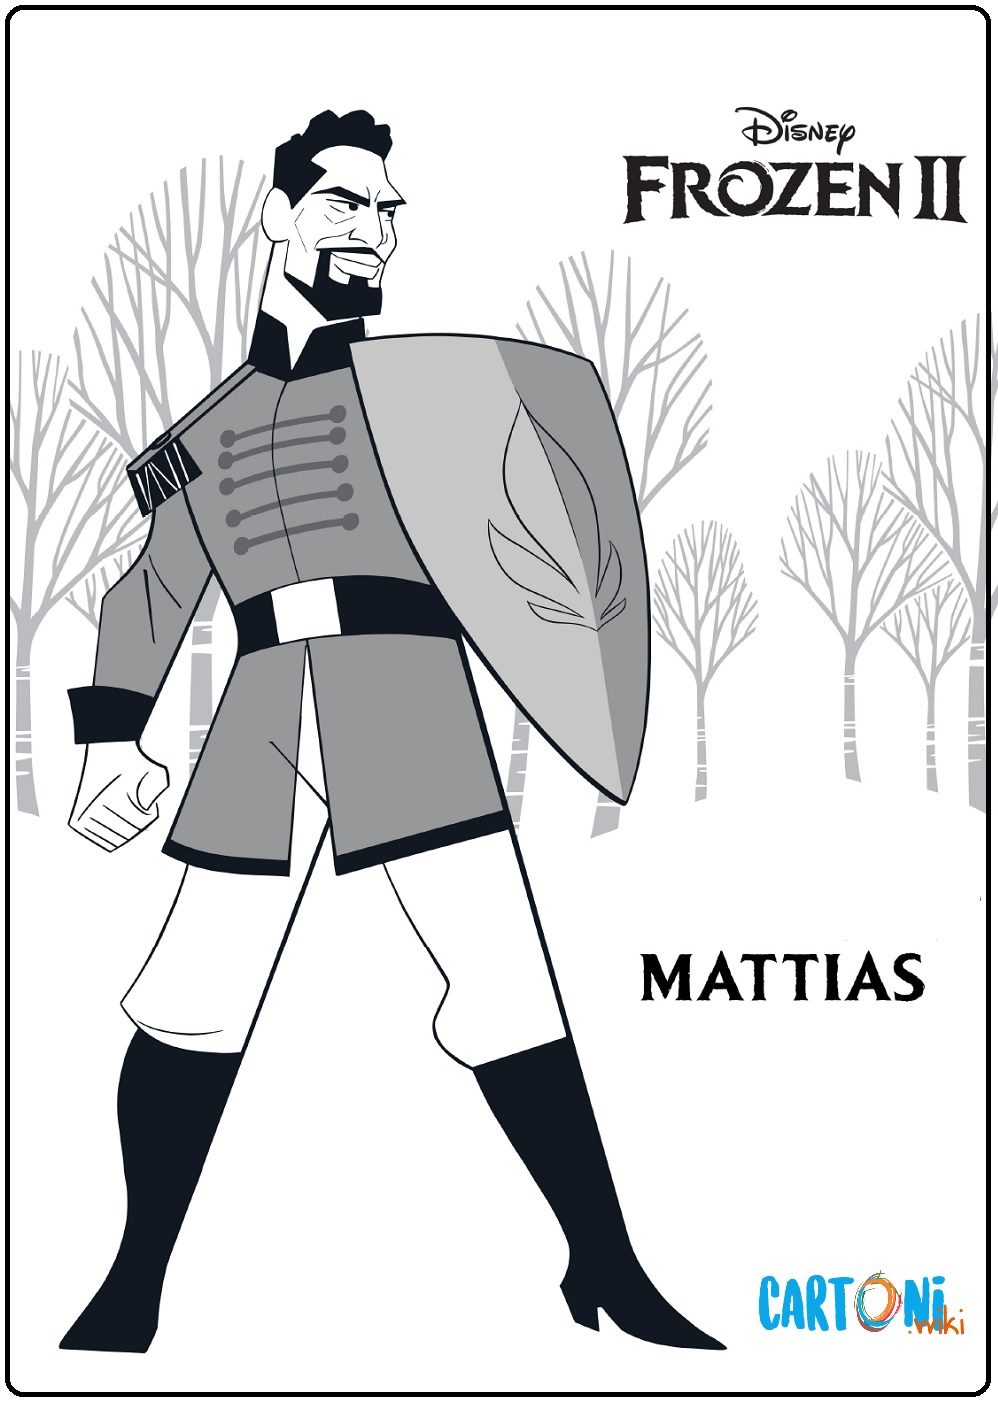 Tenente Mattias Frozen 2